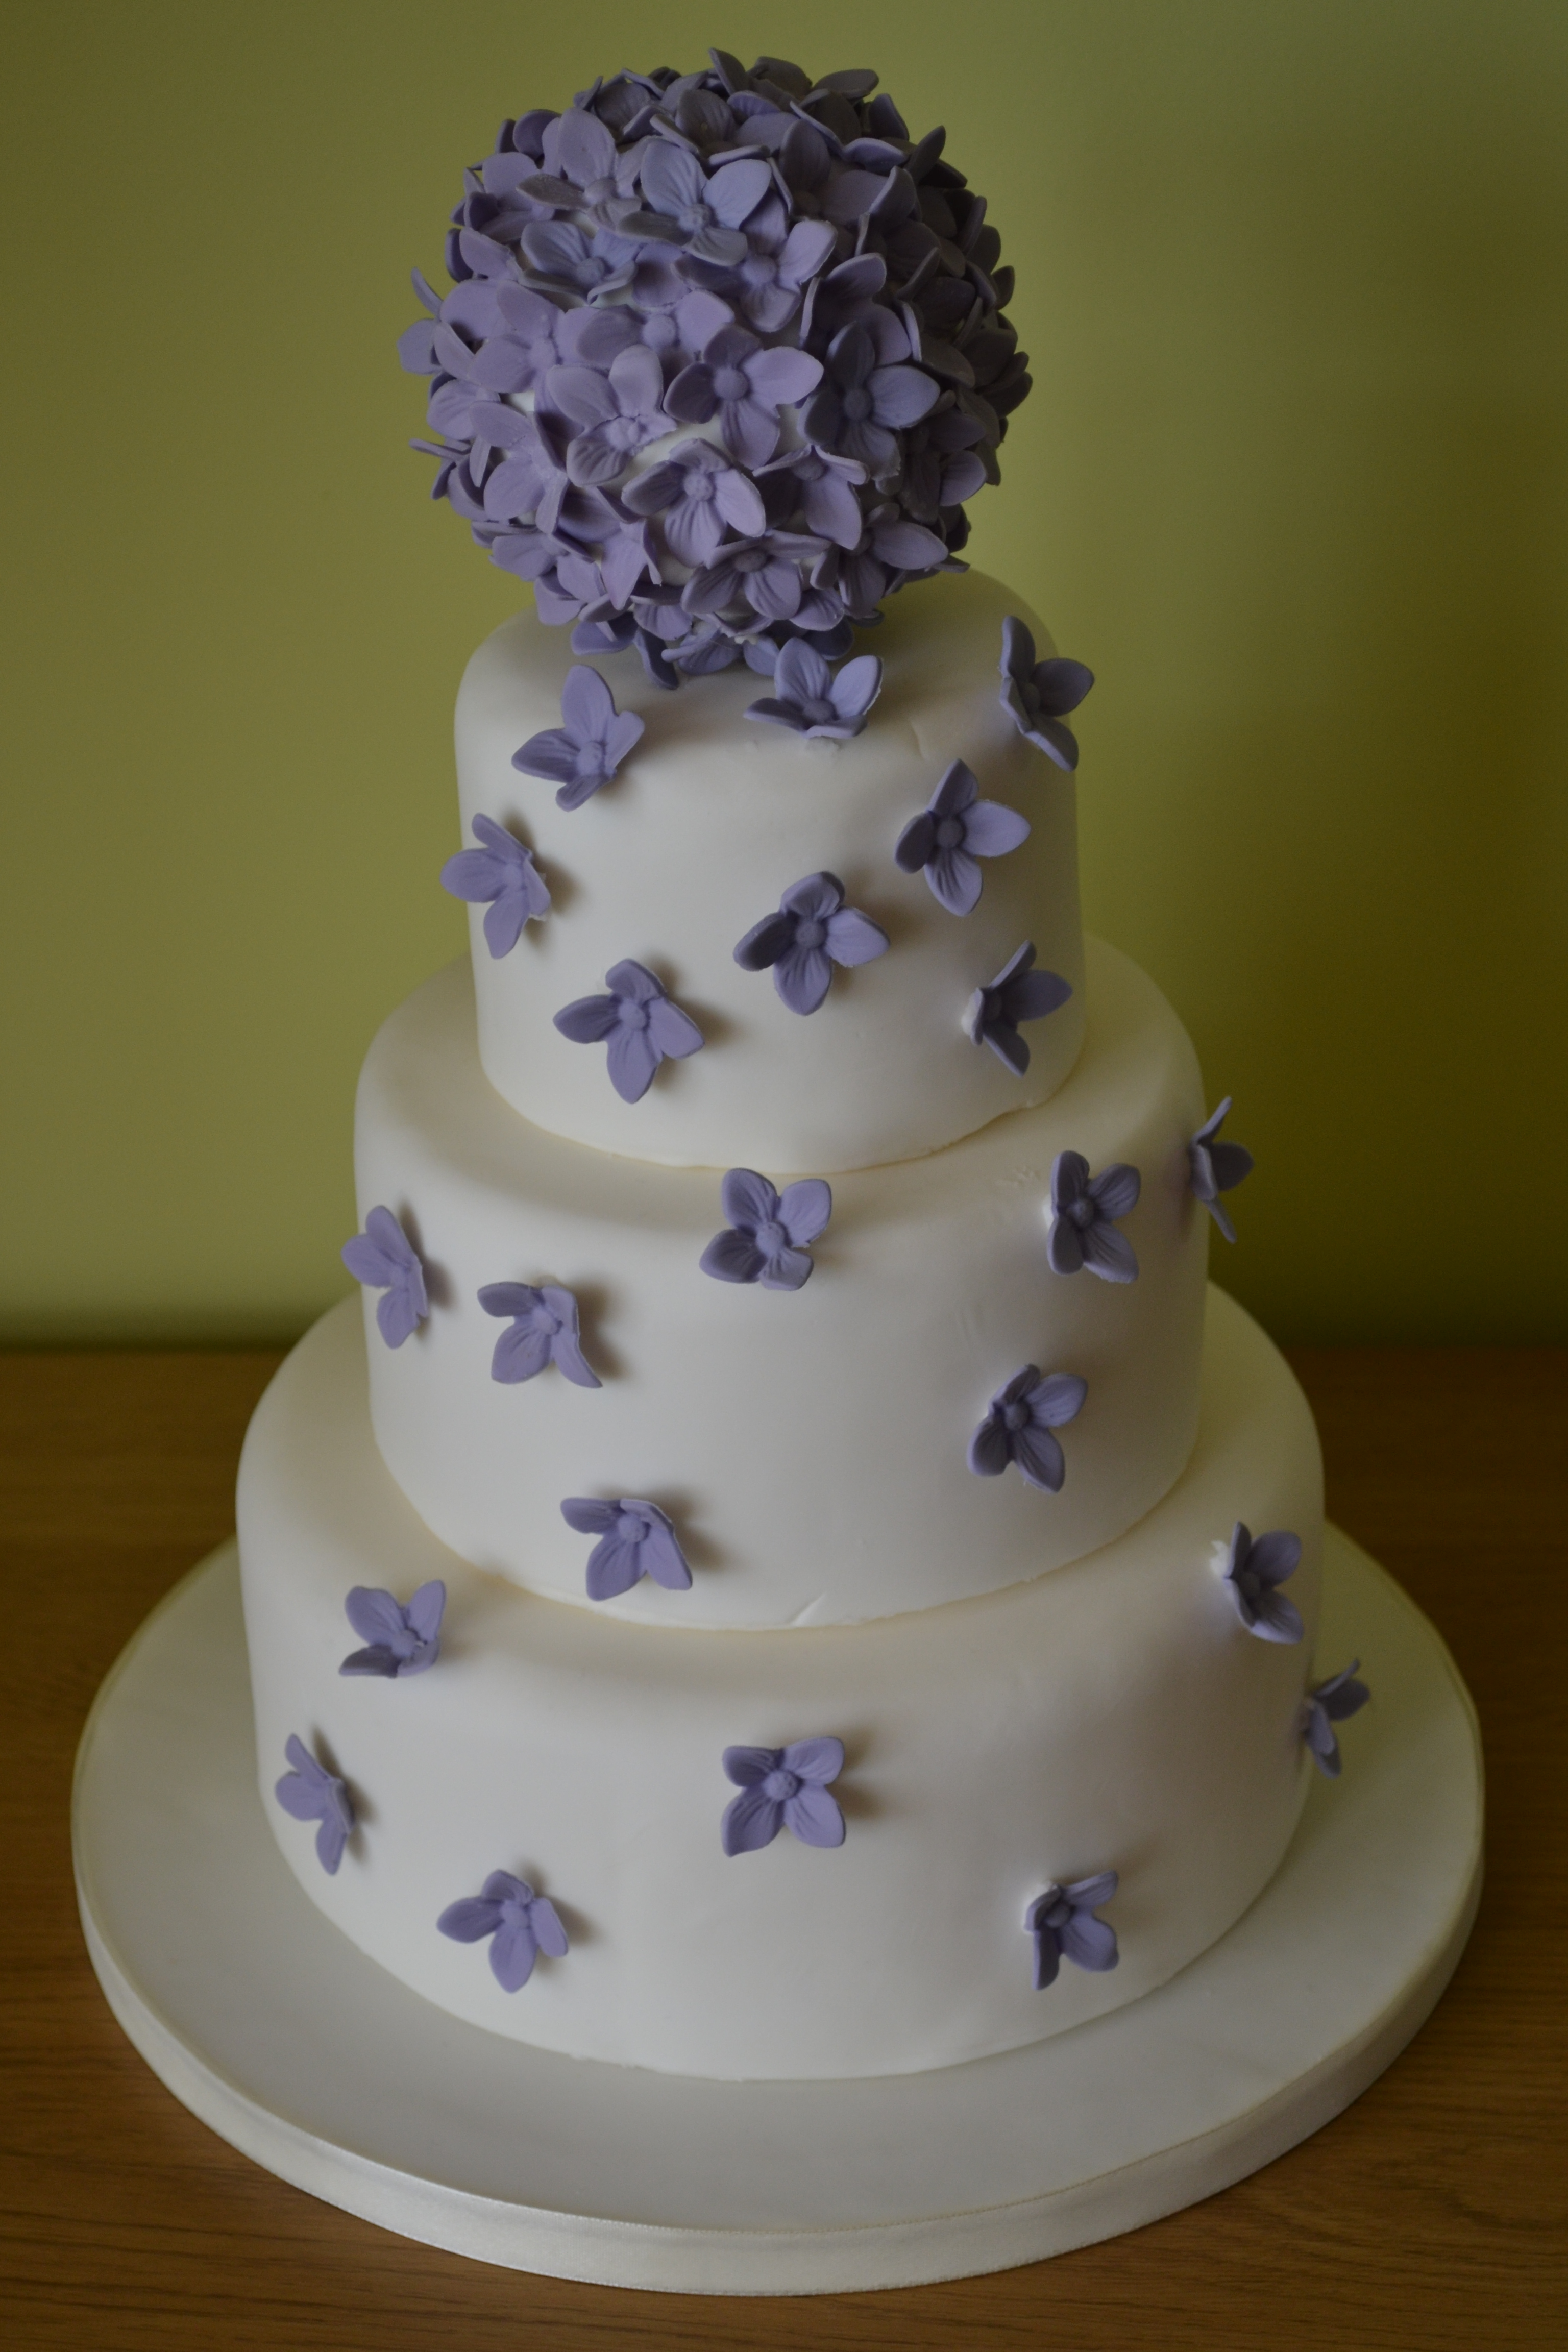 ... Wedding Cake For You! DSC_0518